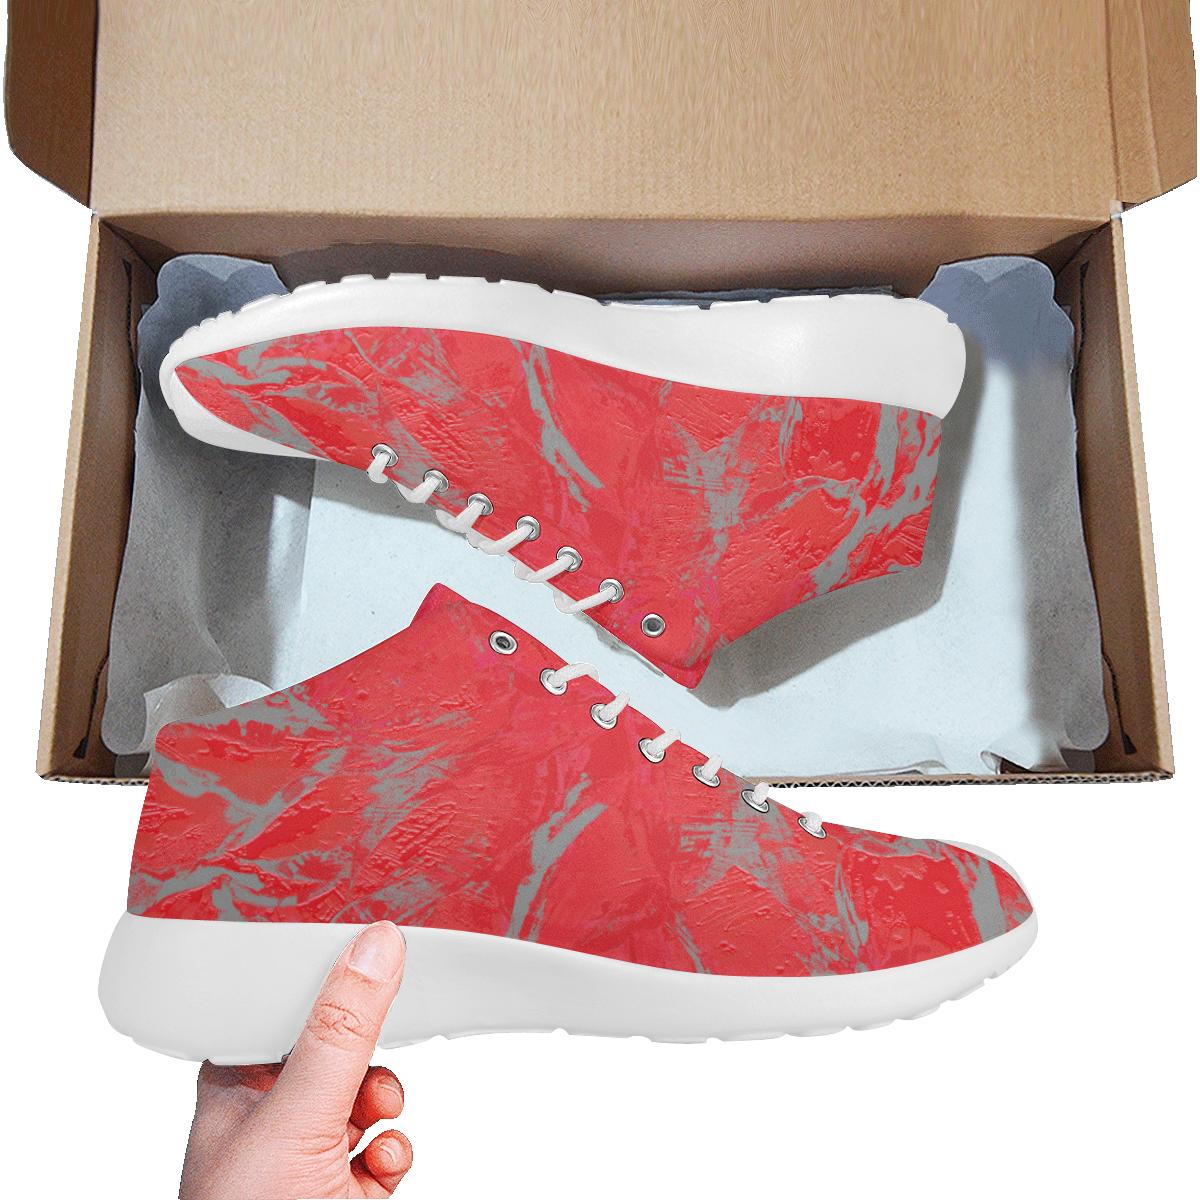 wheelVibe_8500 6 JUICY RED MAROON low Women's Basketball Training Shoes (Model 47502)